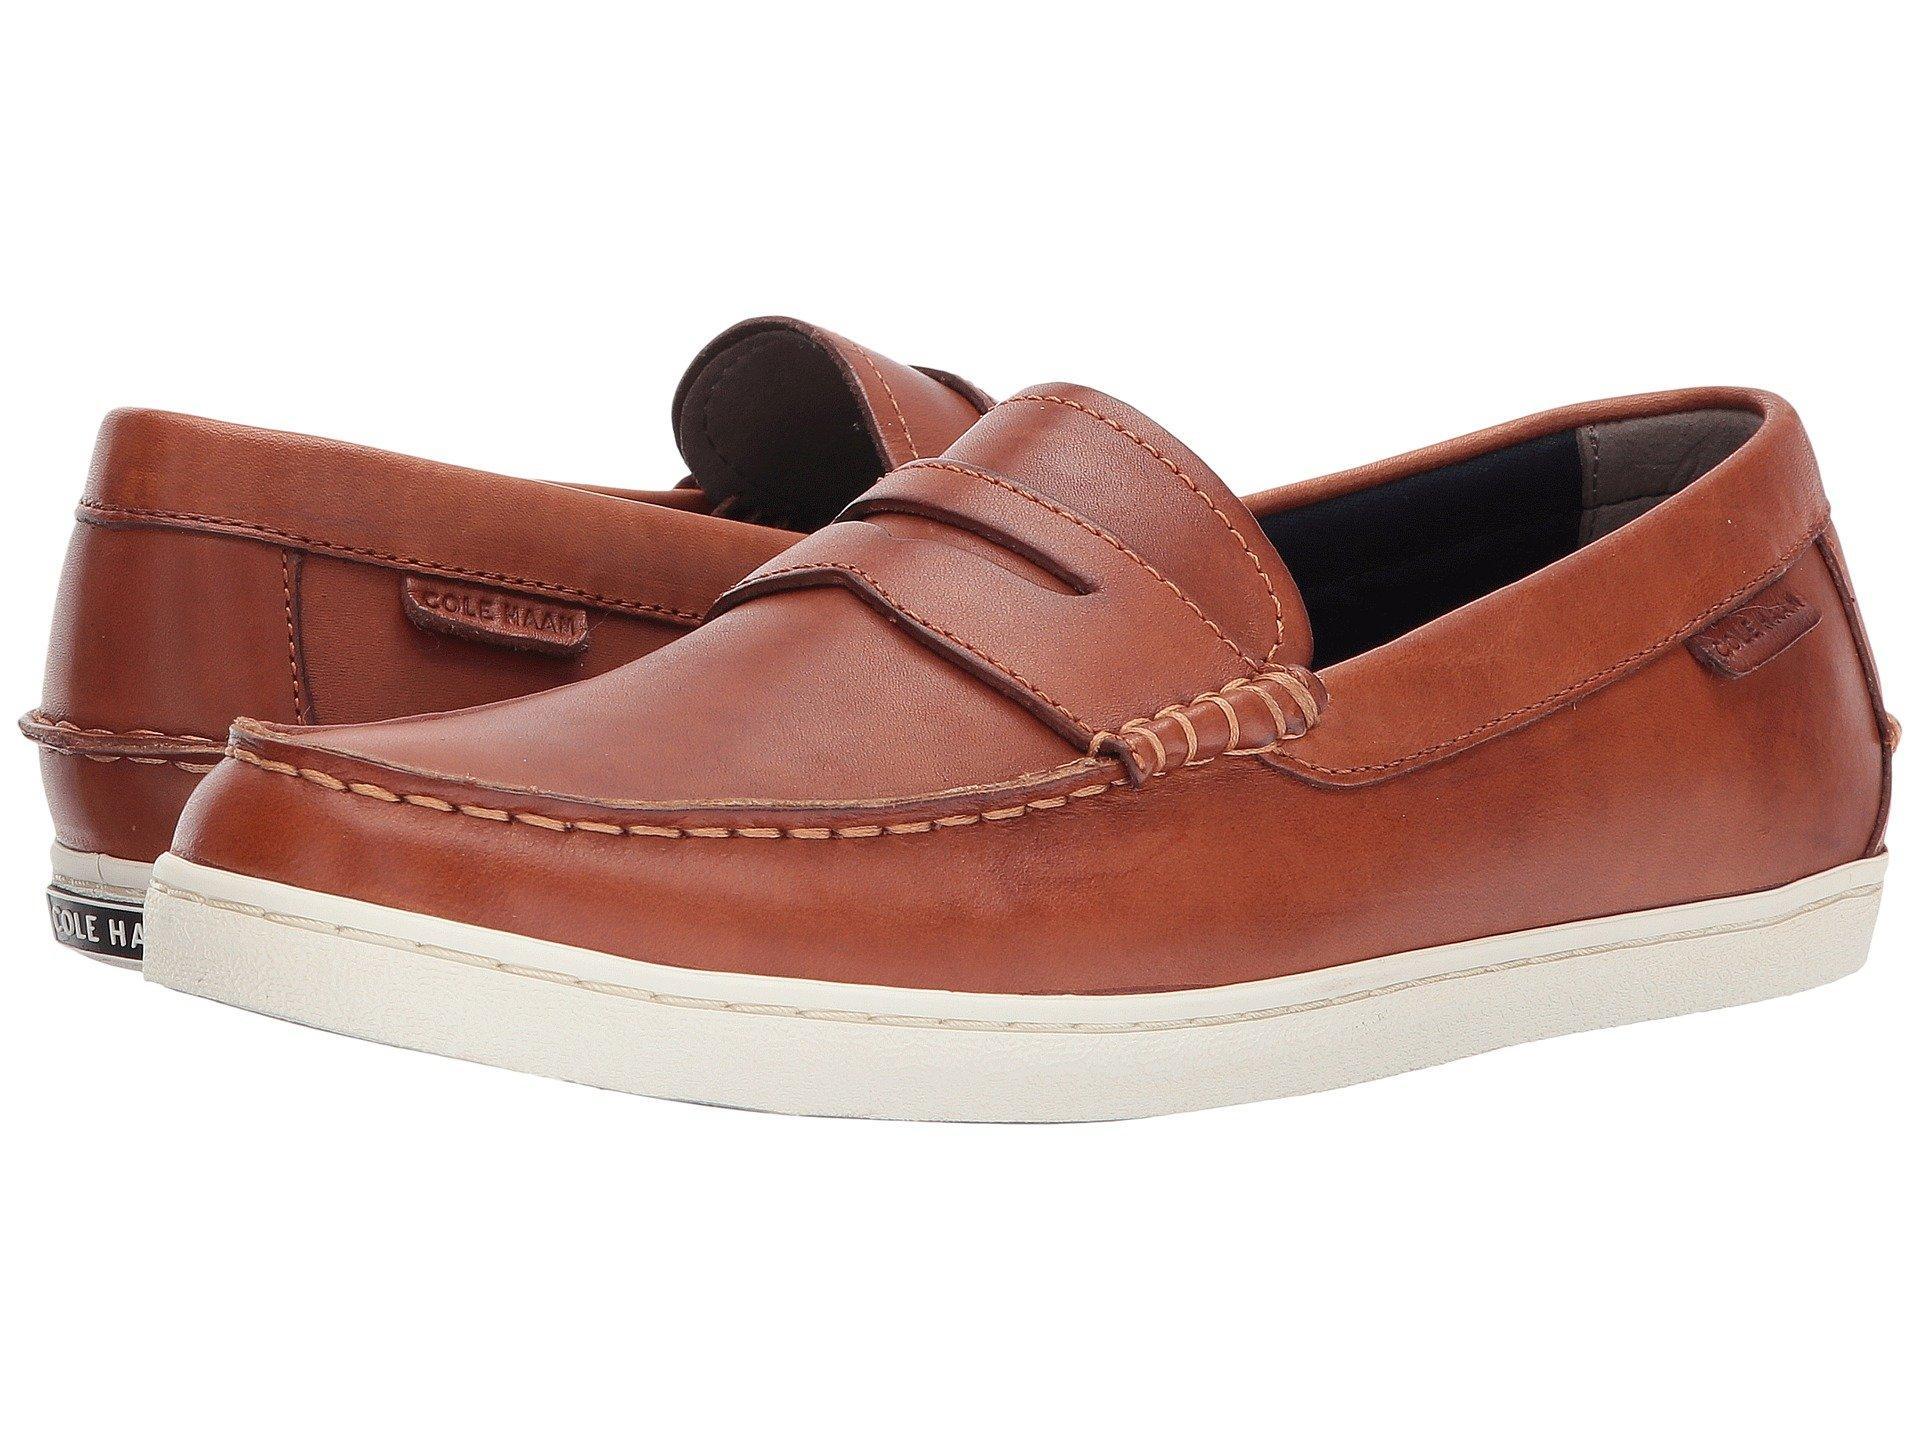 880e845c092 Cole Haan Nantucket Loafer In British Tan Handstain | ModeSens